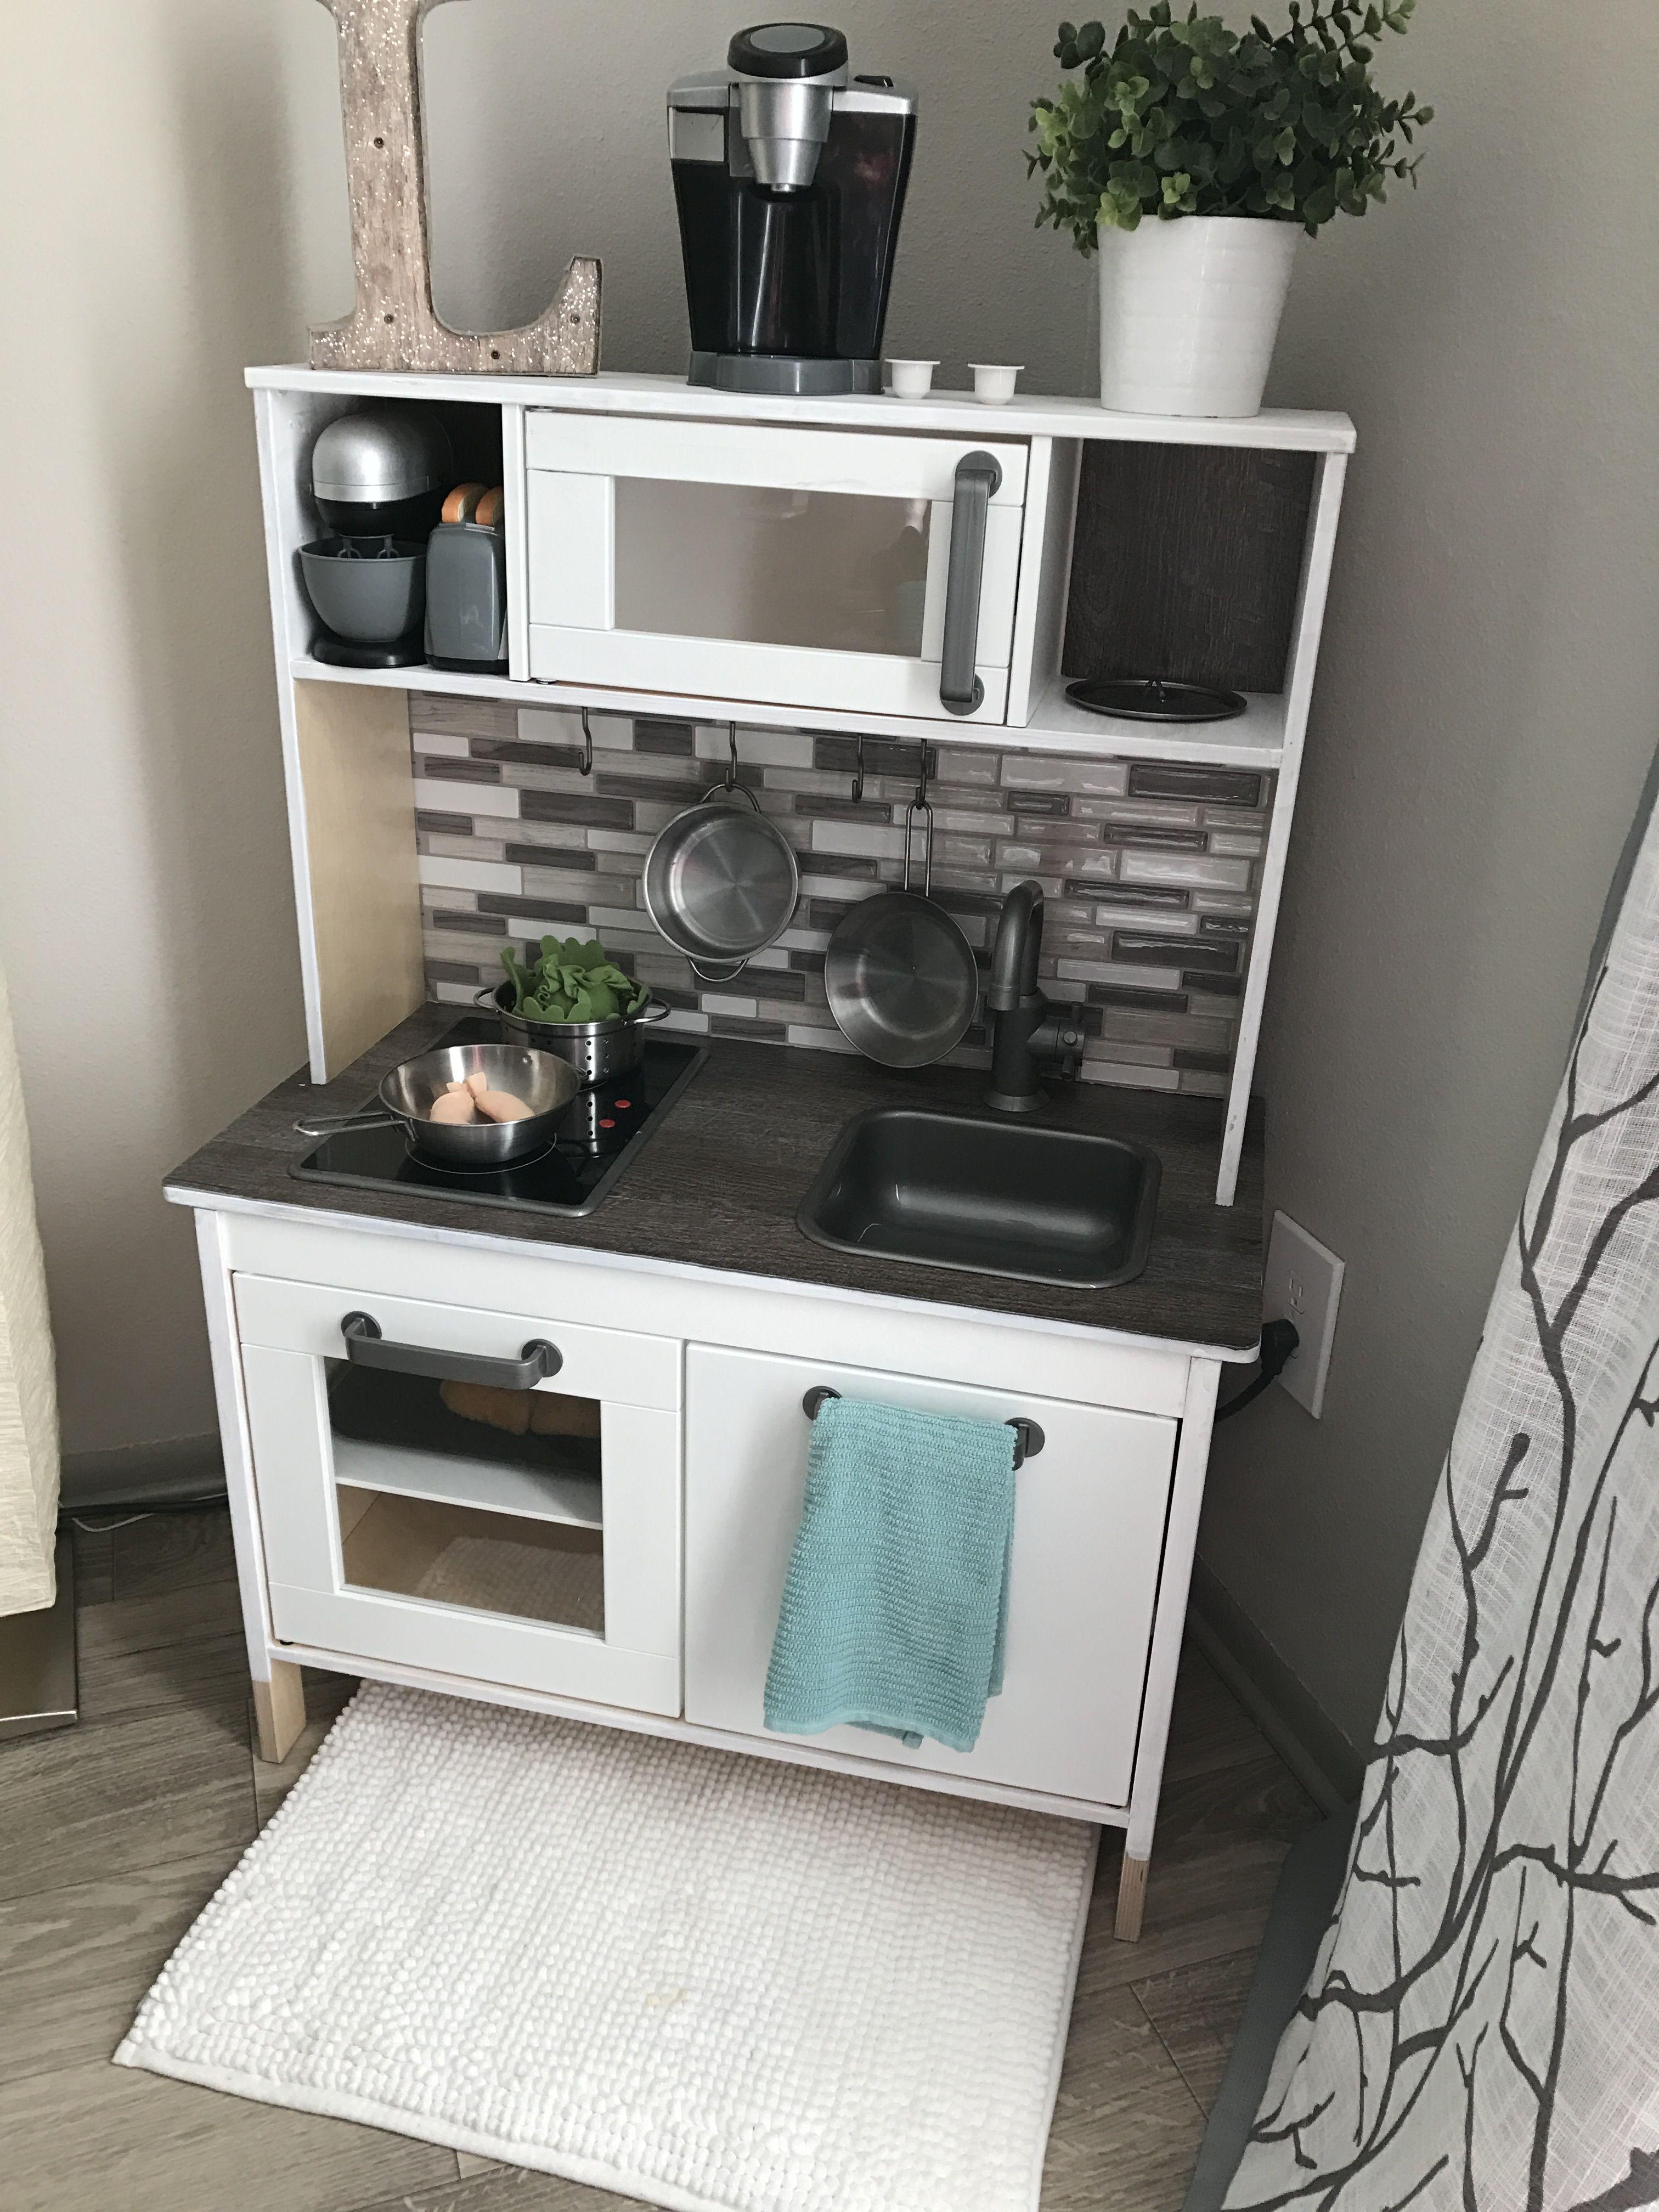 DIY renovation IKEA kids kitchen | Home | Cucina ikea, Camerette e Ikea